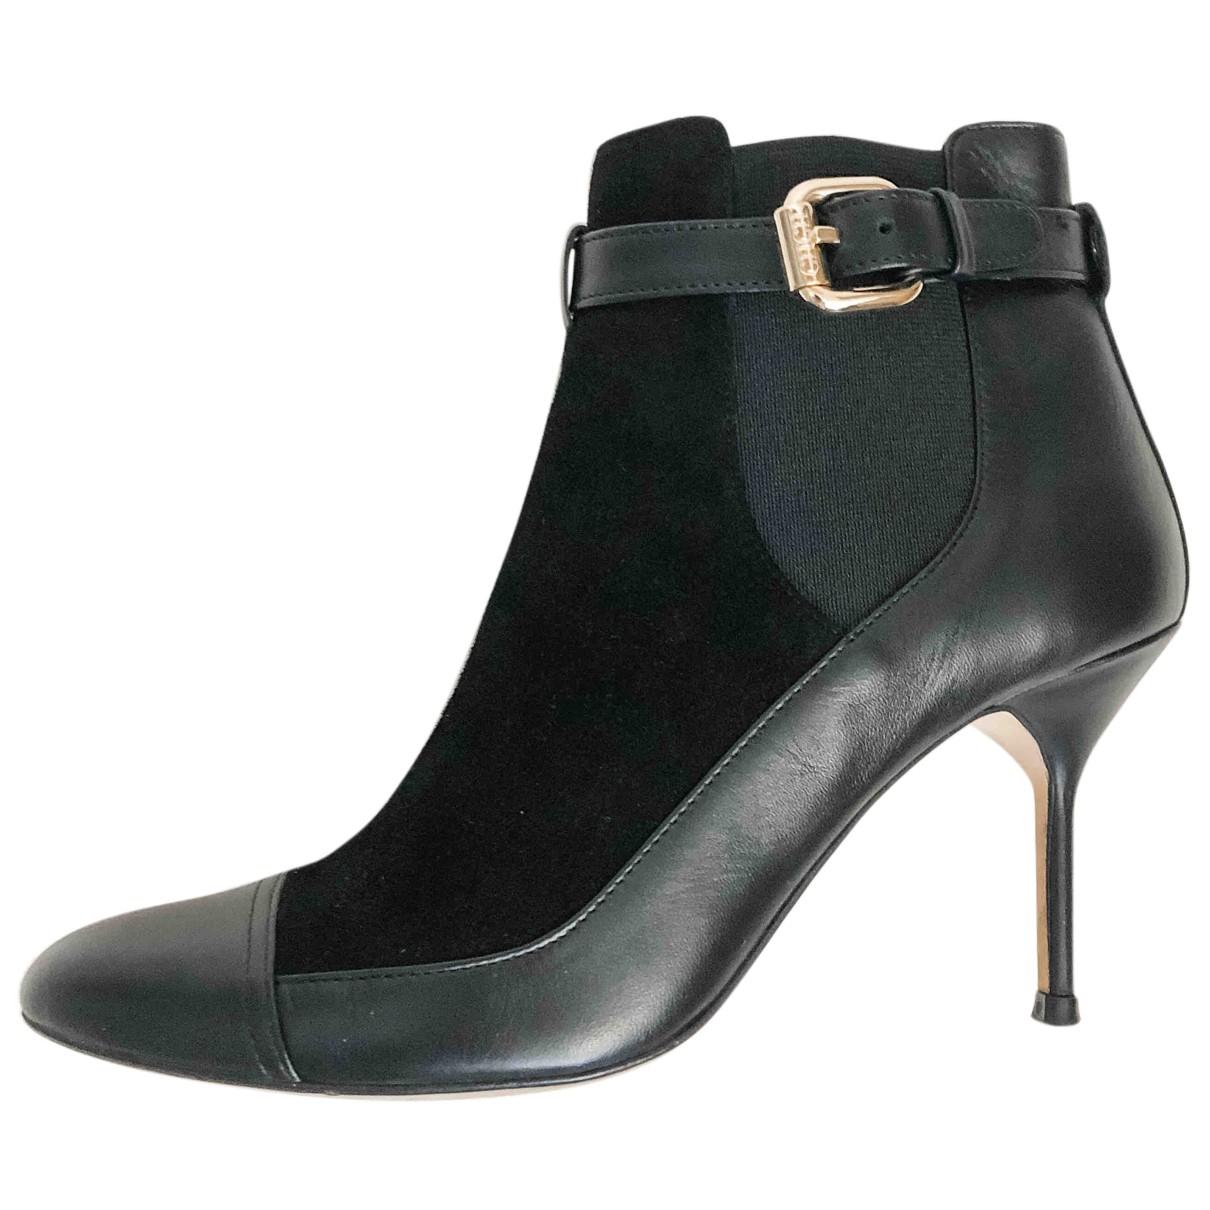 Carolina Herrera - Bottes   pour femme en cuir - noir